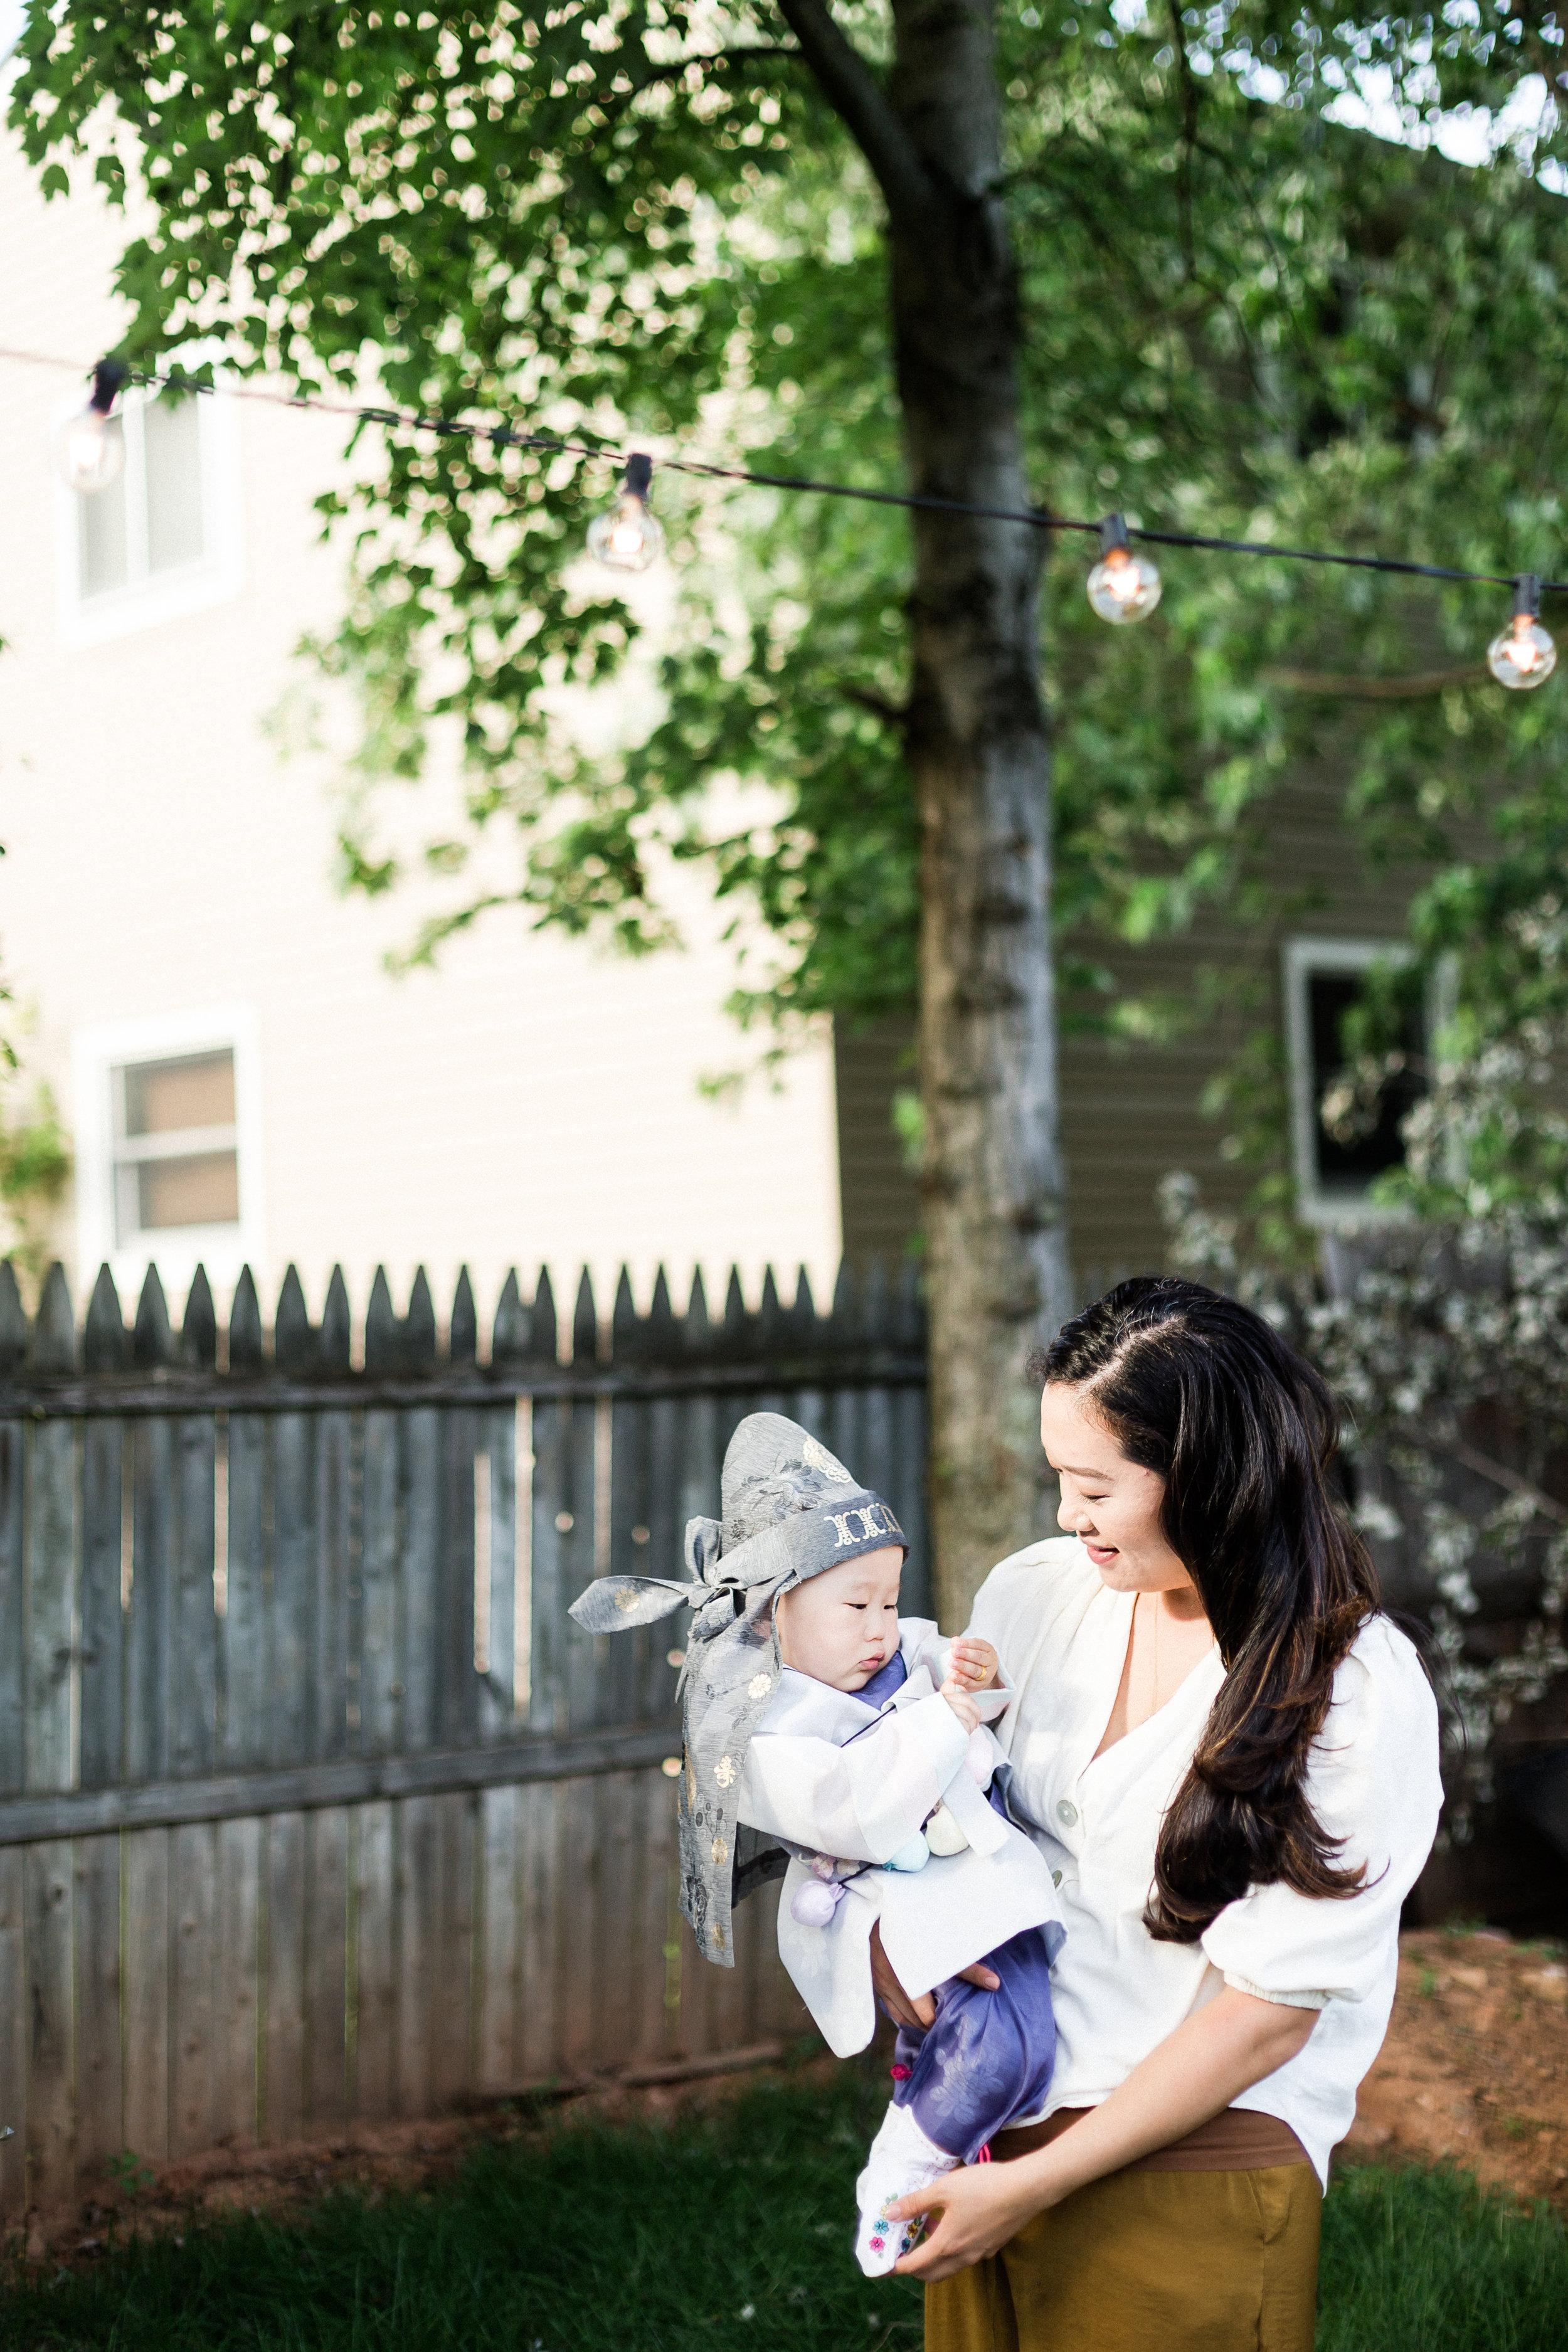 lissie-loomis-photo-nyc-family-photographer-brooklyn-baby2.JPG